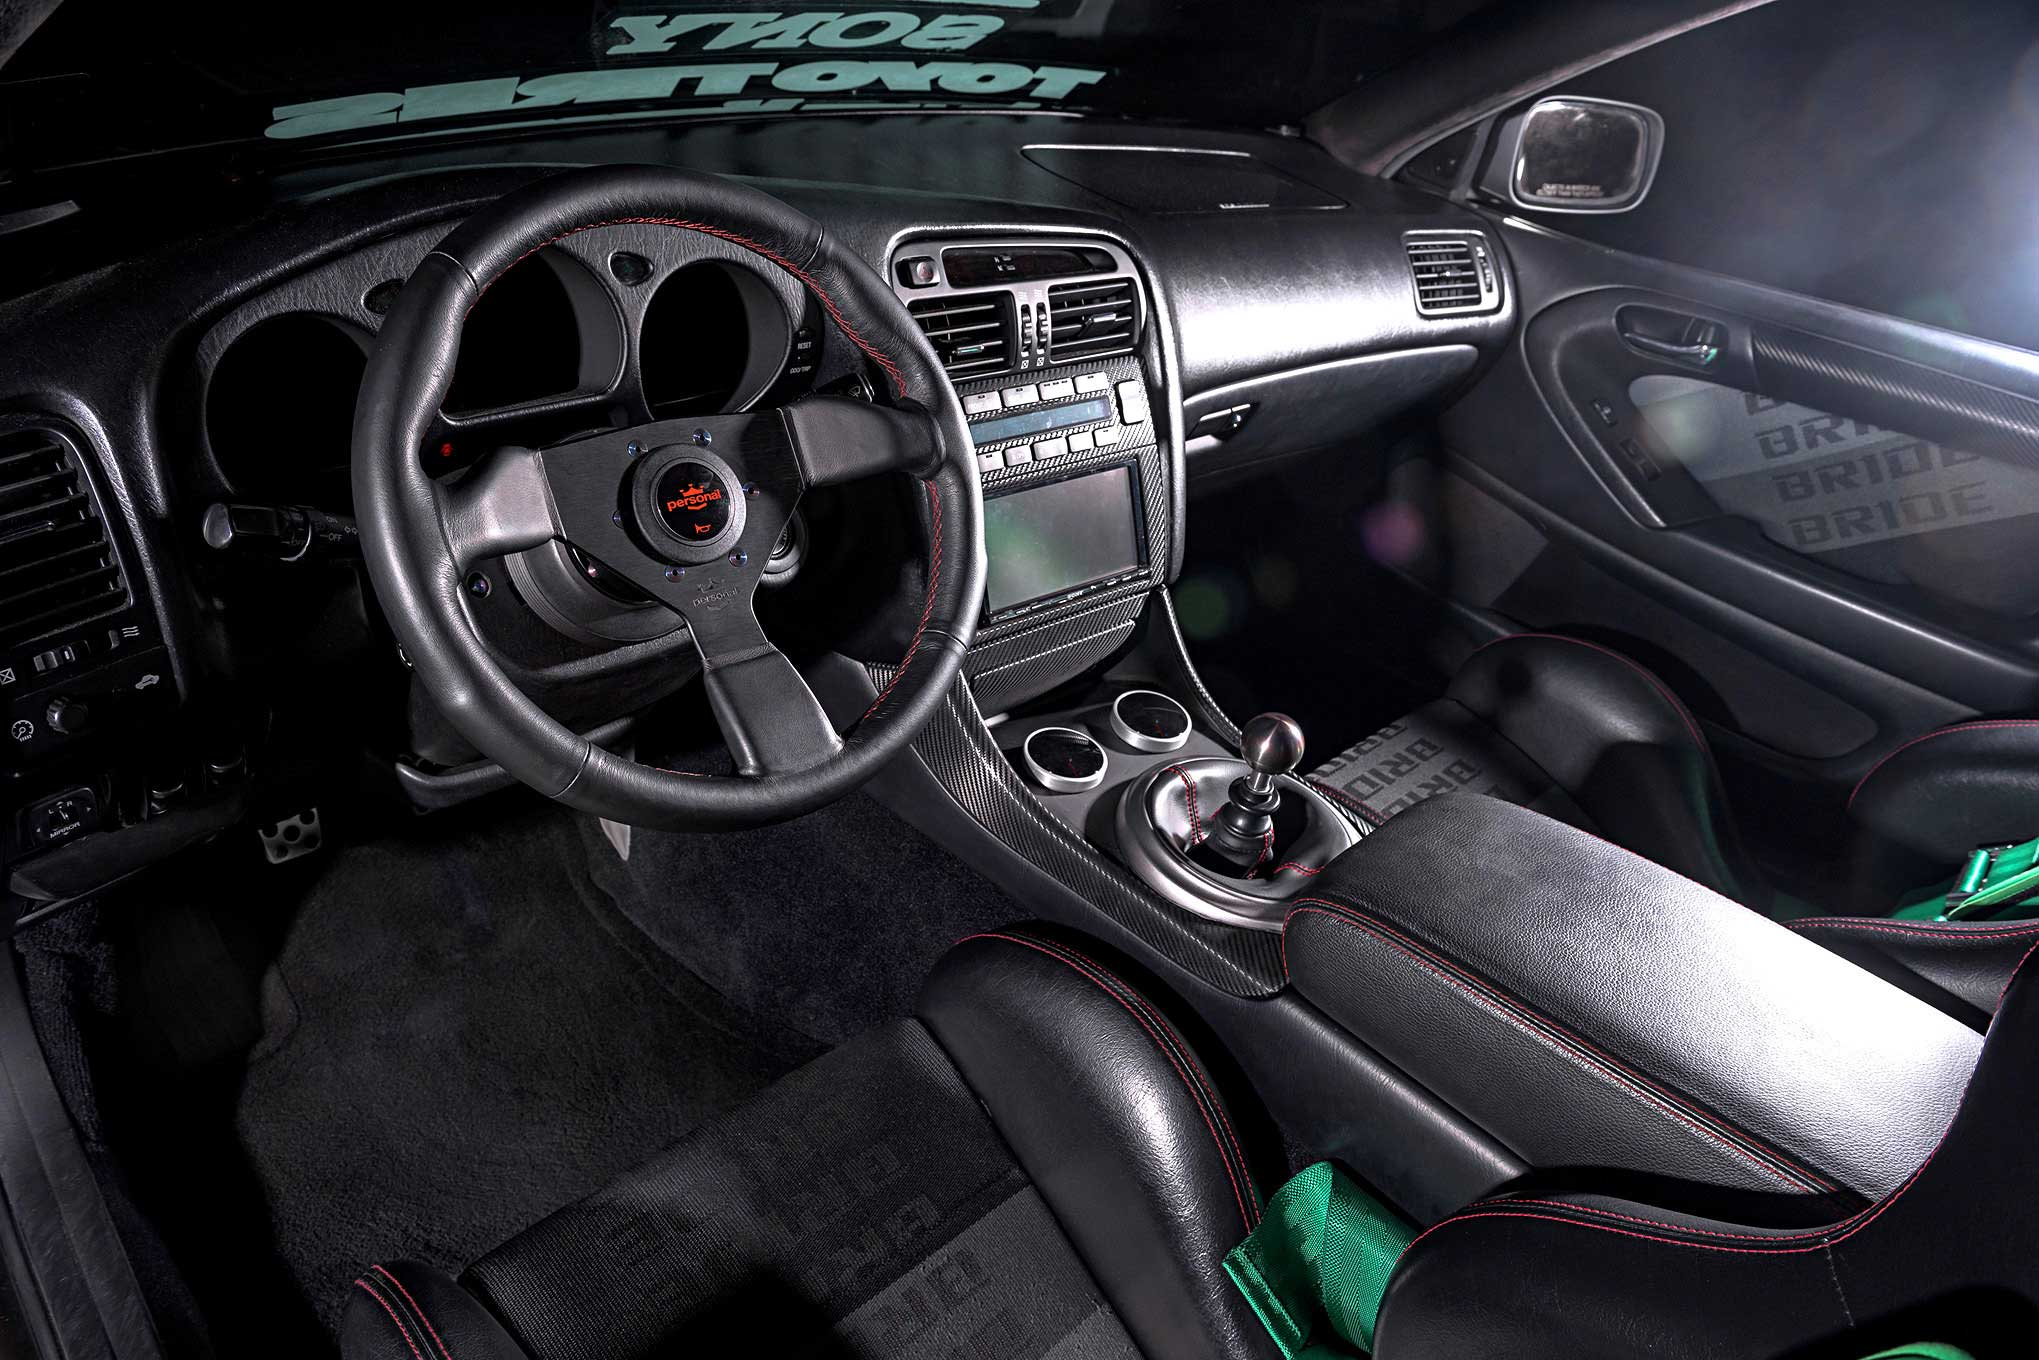 1998 lexus gs400 personal grinta steering wheel [ 2039 x 1360 Pixel ]